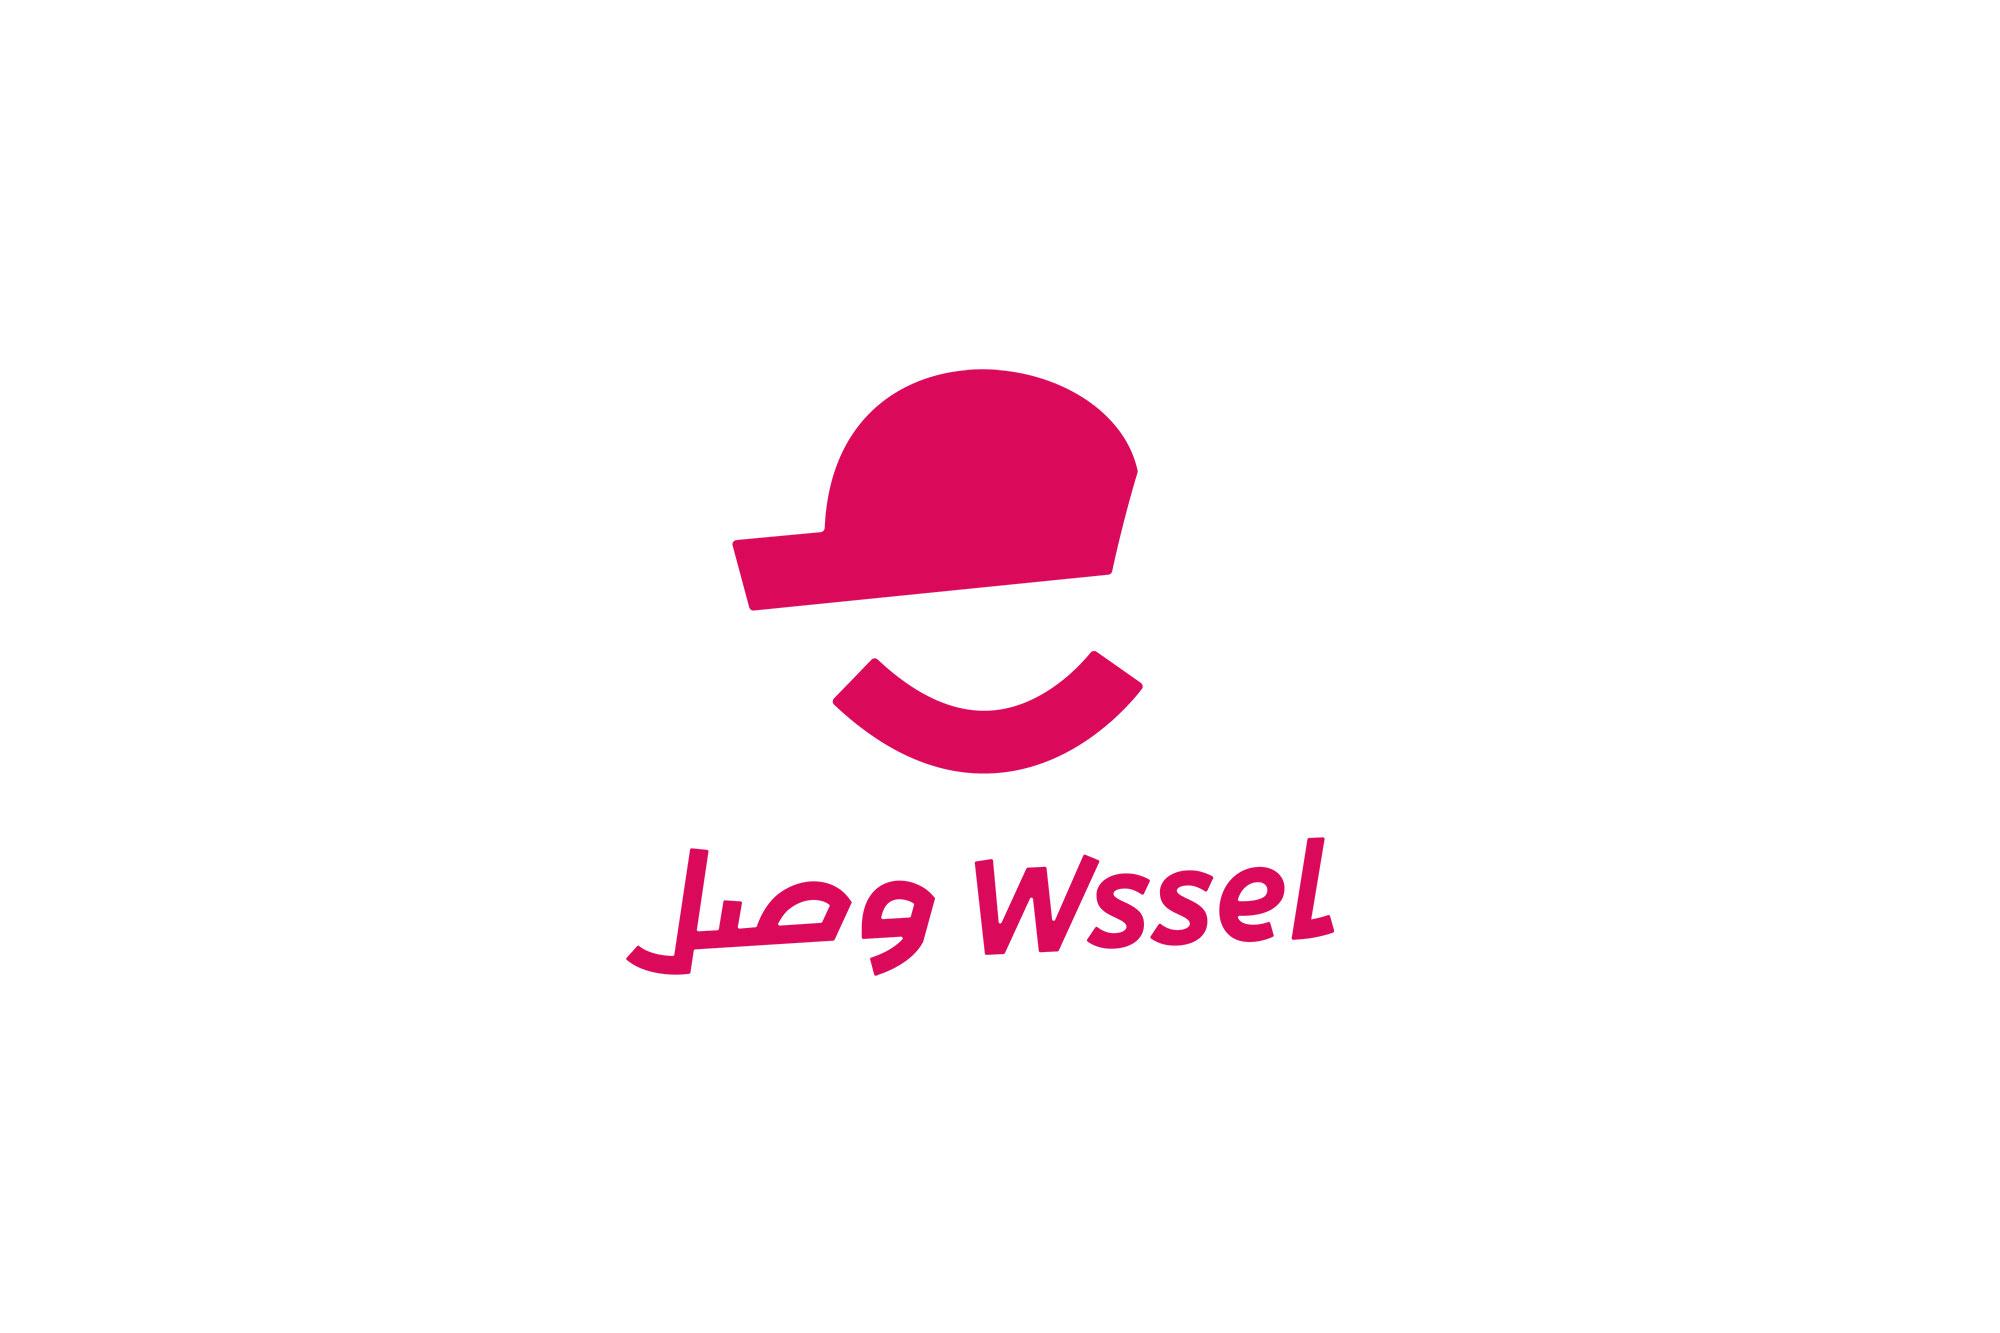 Wssel-Work-By-YaStudio-Logo-01